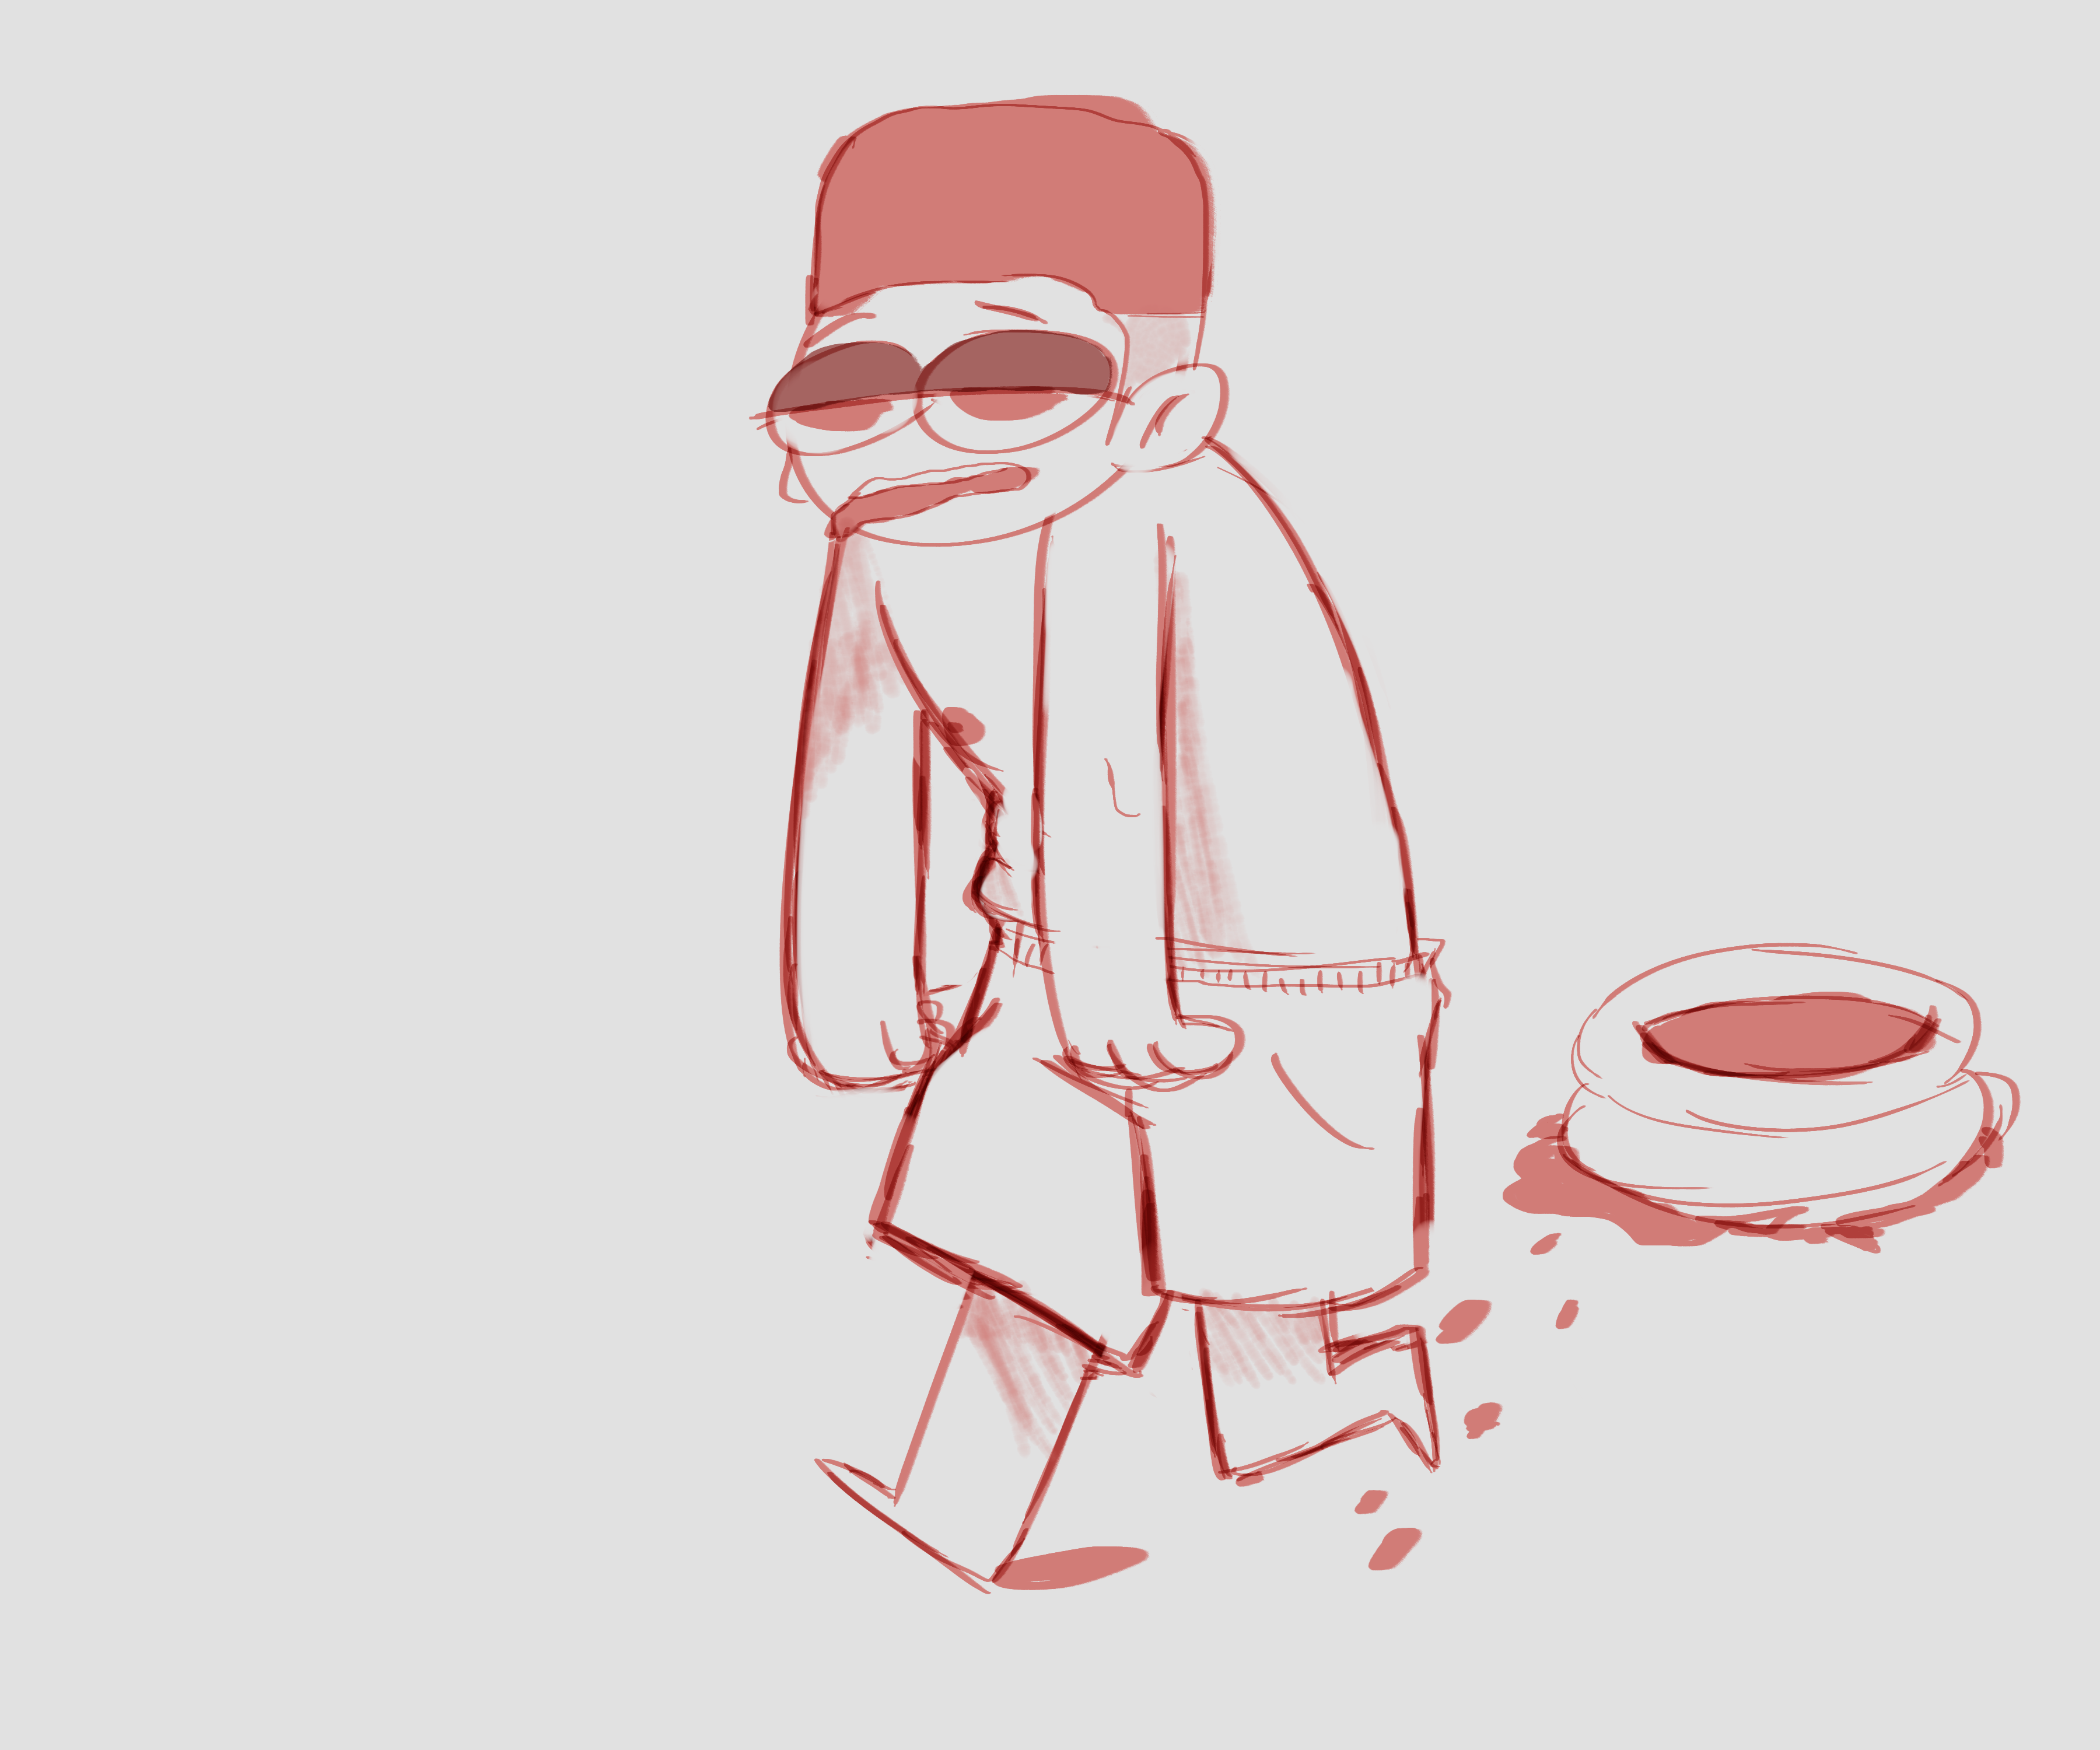 Stream sketch